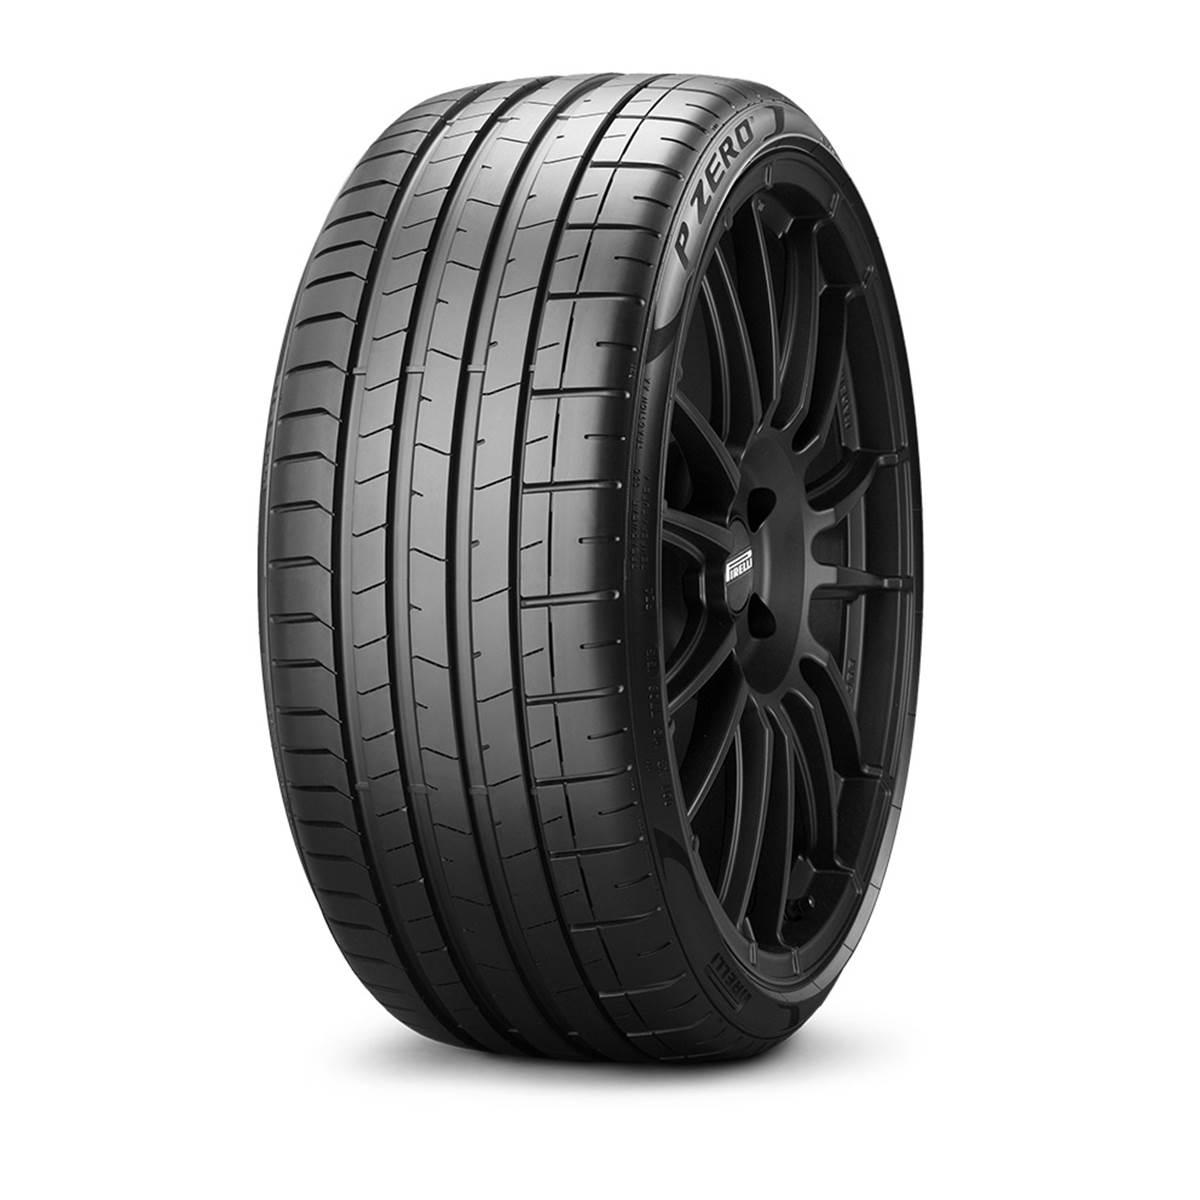 Pneu Pirelli 255/40R20 101W Pzero XL